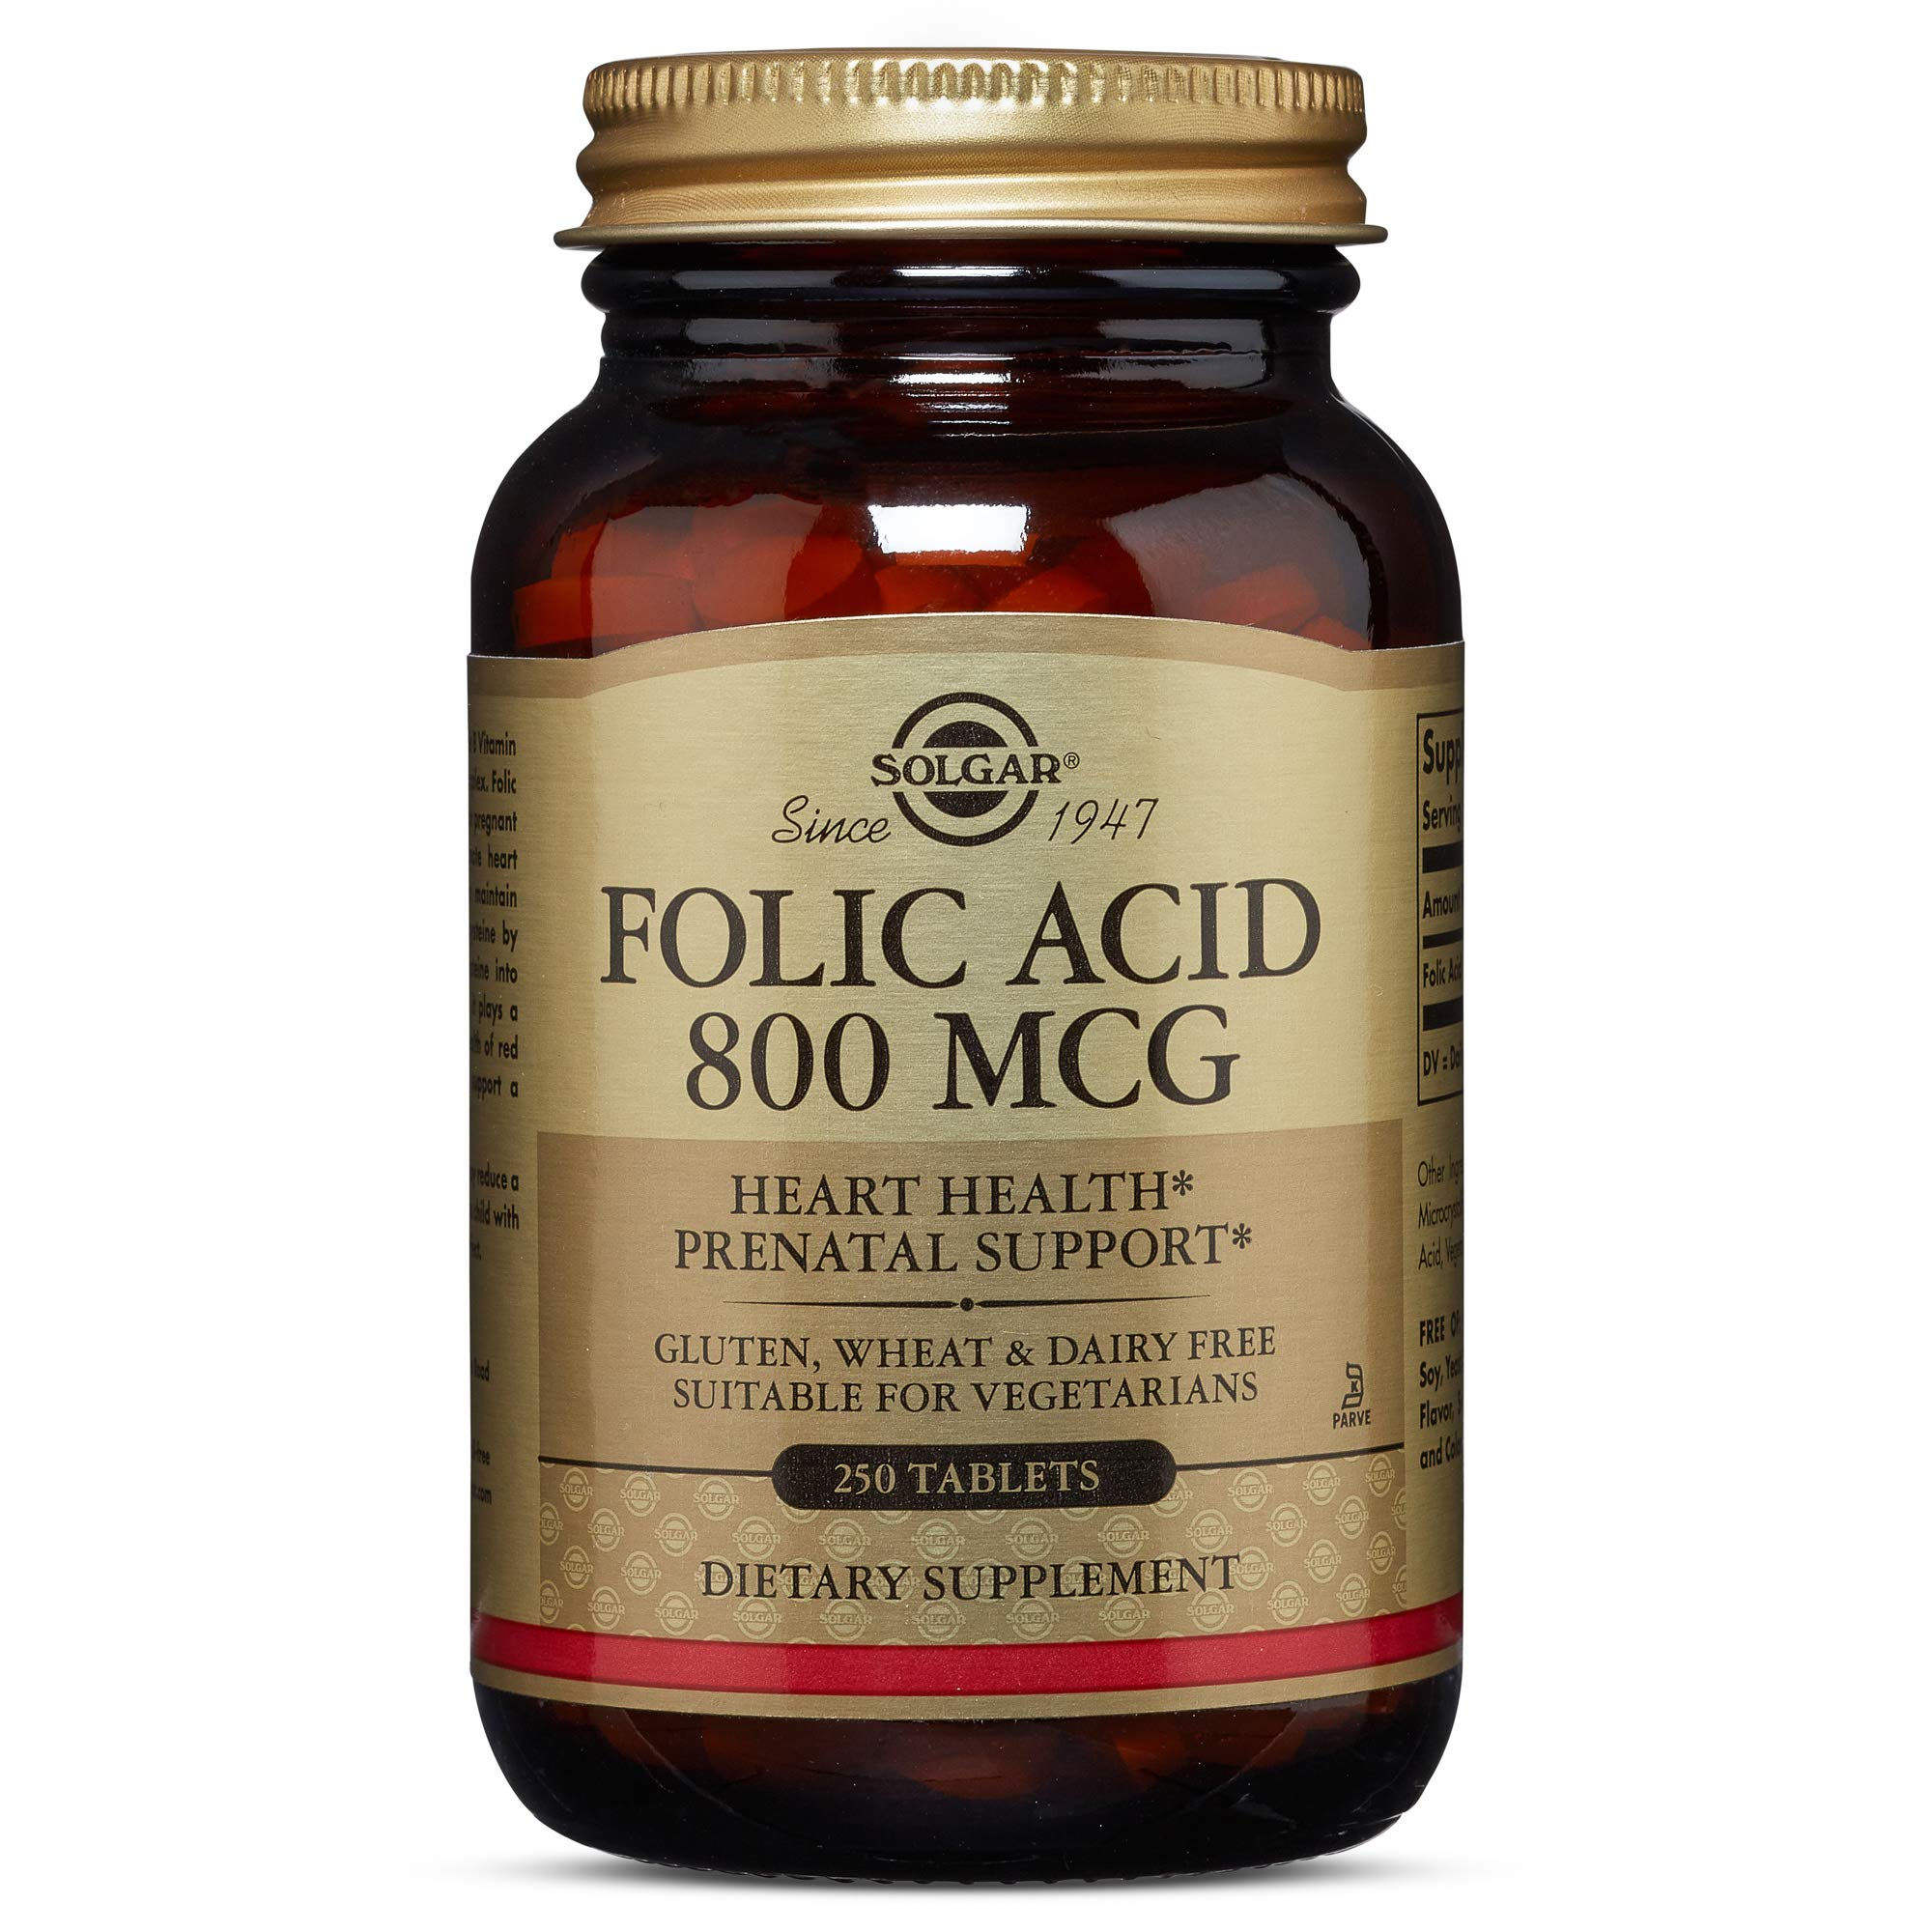 Solgar - Folic Acid 800 mcg, 250 Vegetable Capsules - 2 Pack